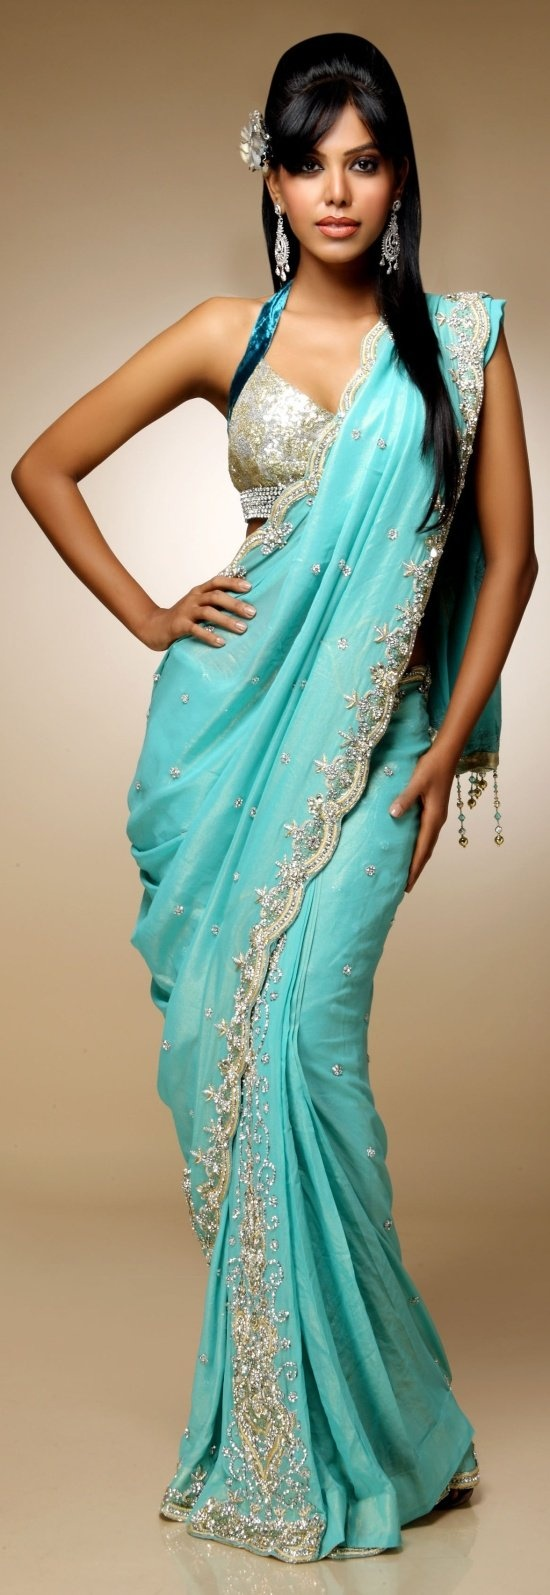 1175 best Eastern Promise images on Pinterest | India fashion ...